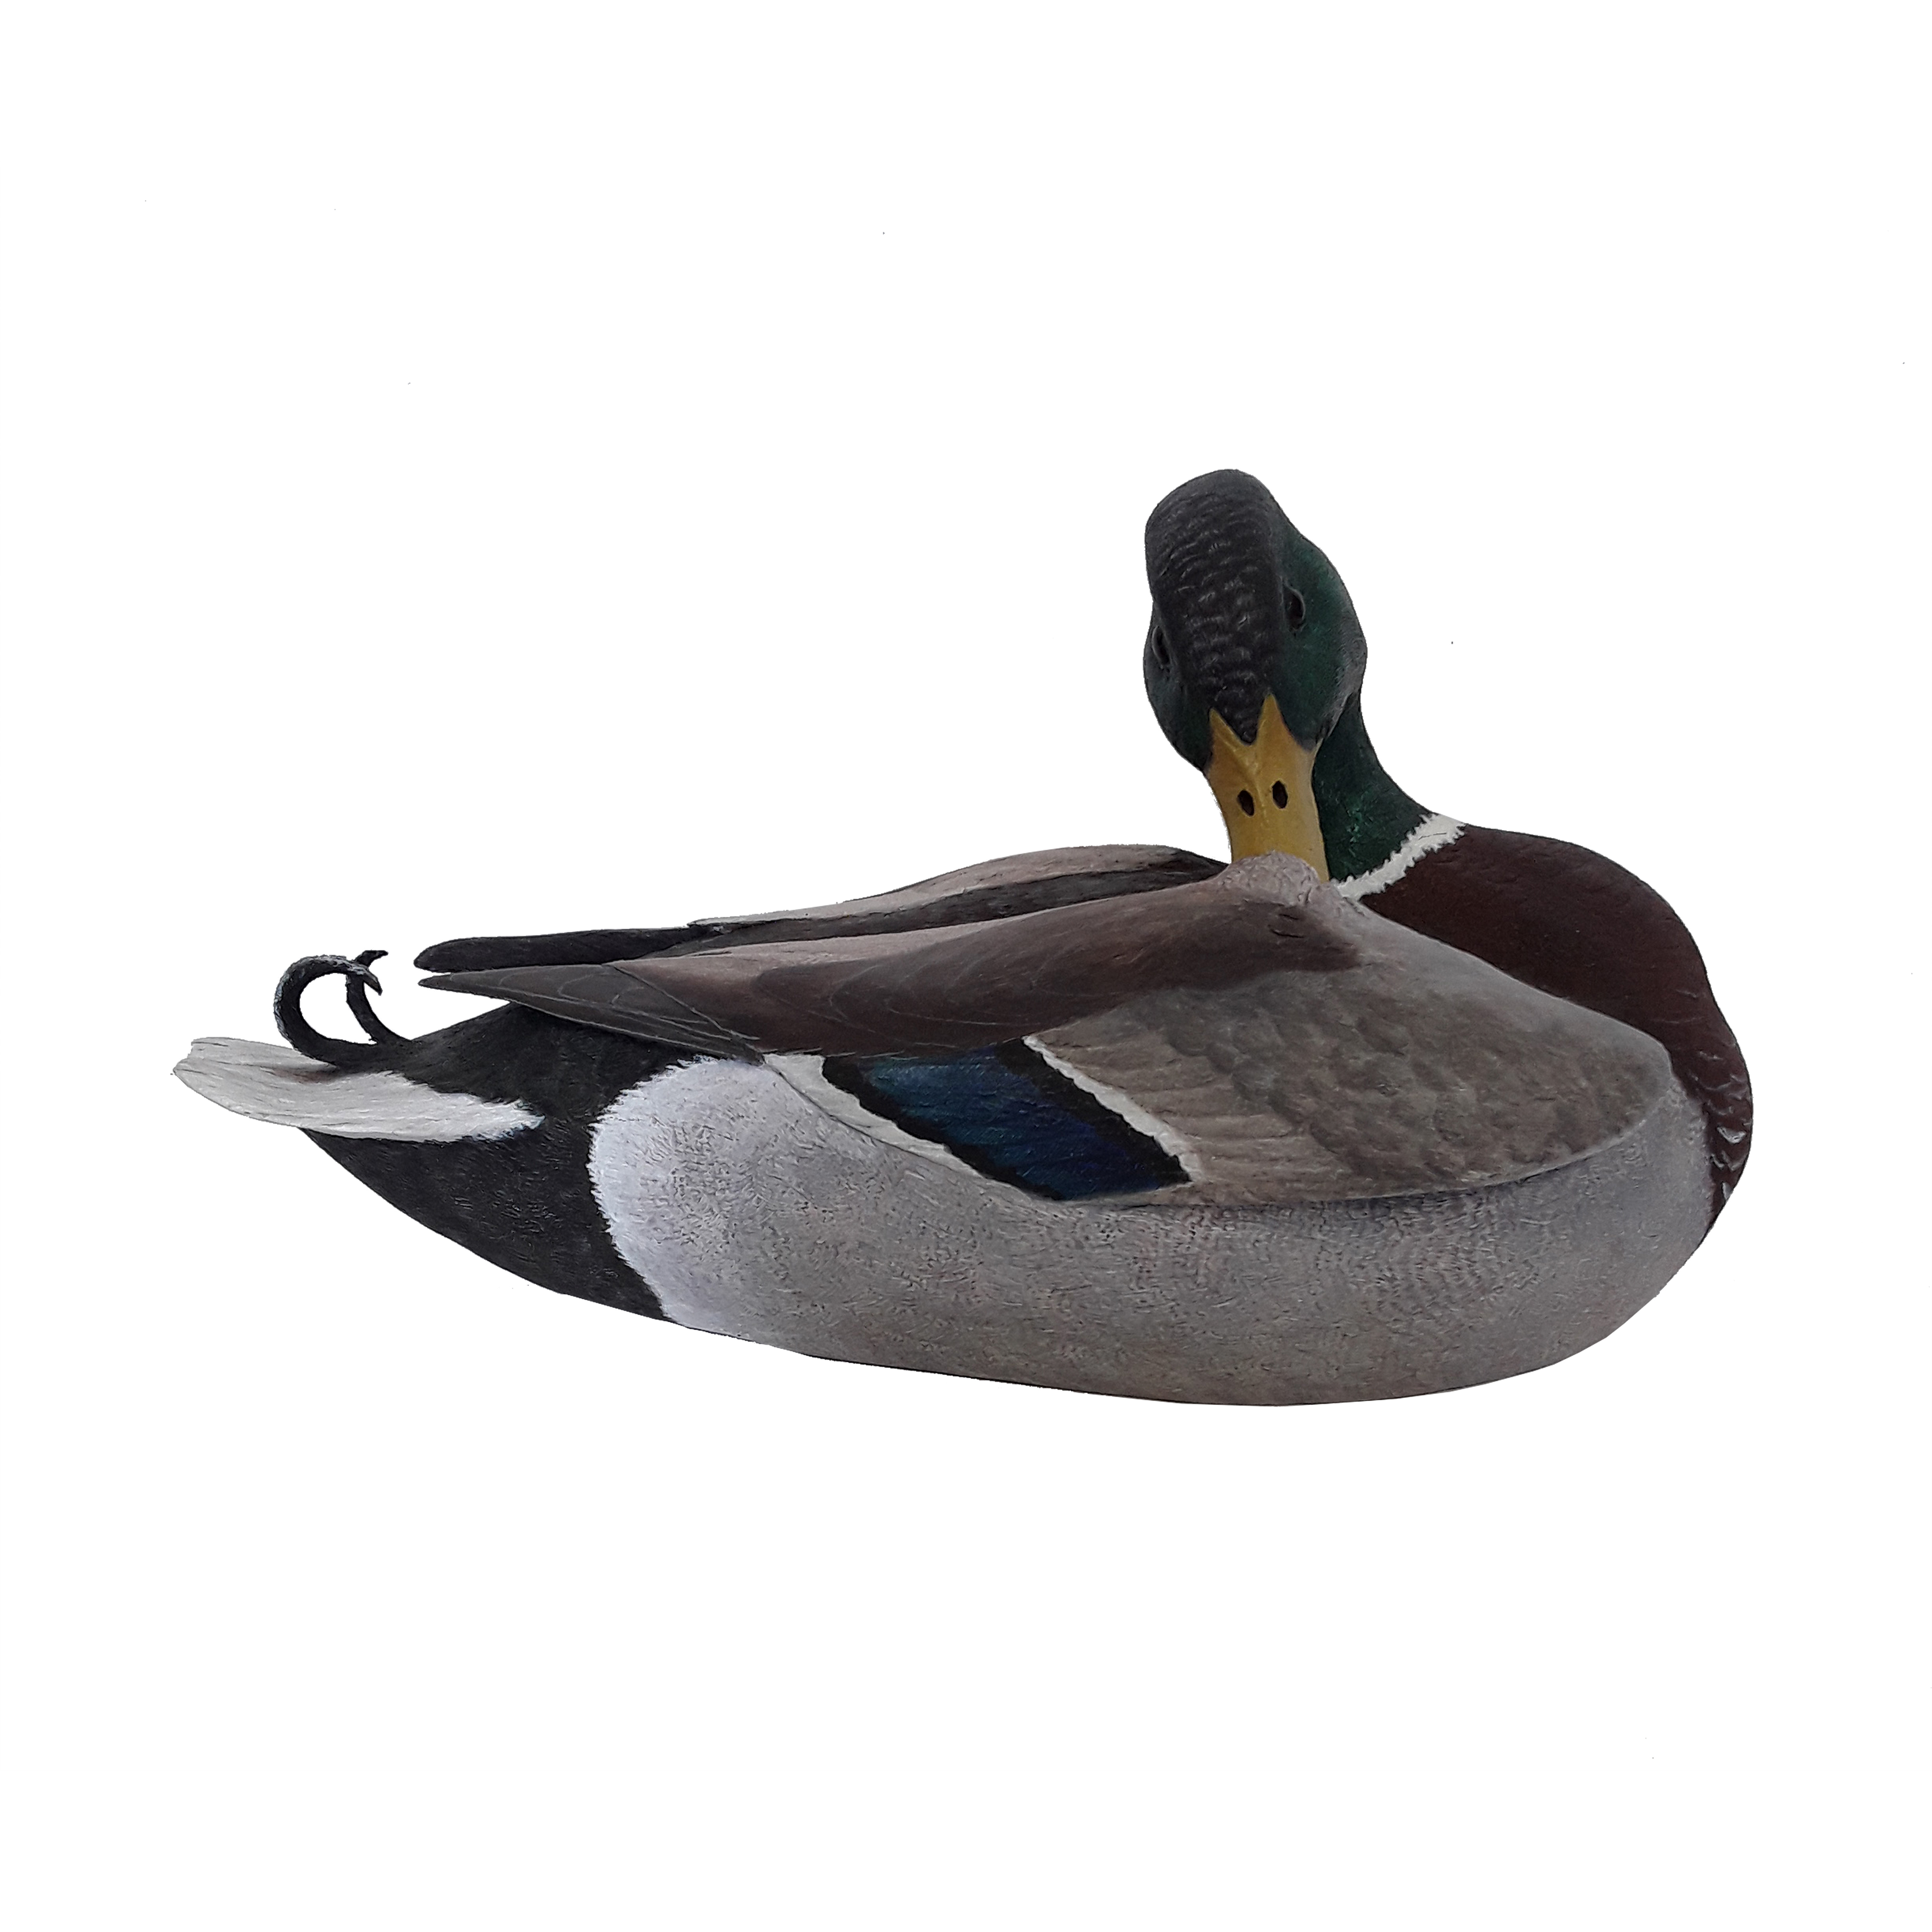 Tony Bendig's Mallard Drake Duck Carving